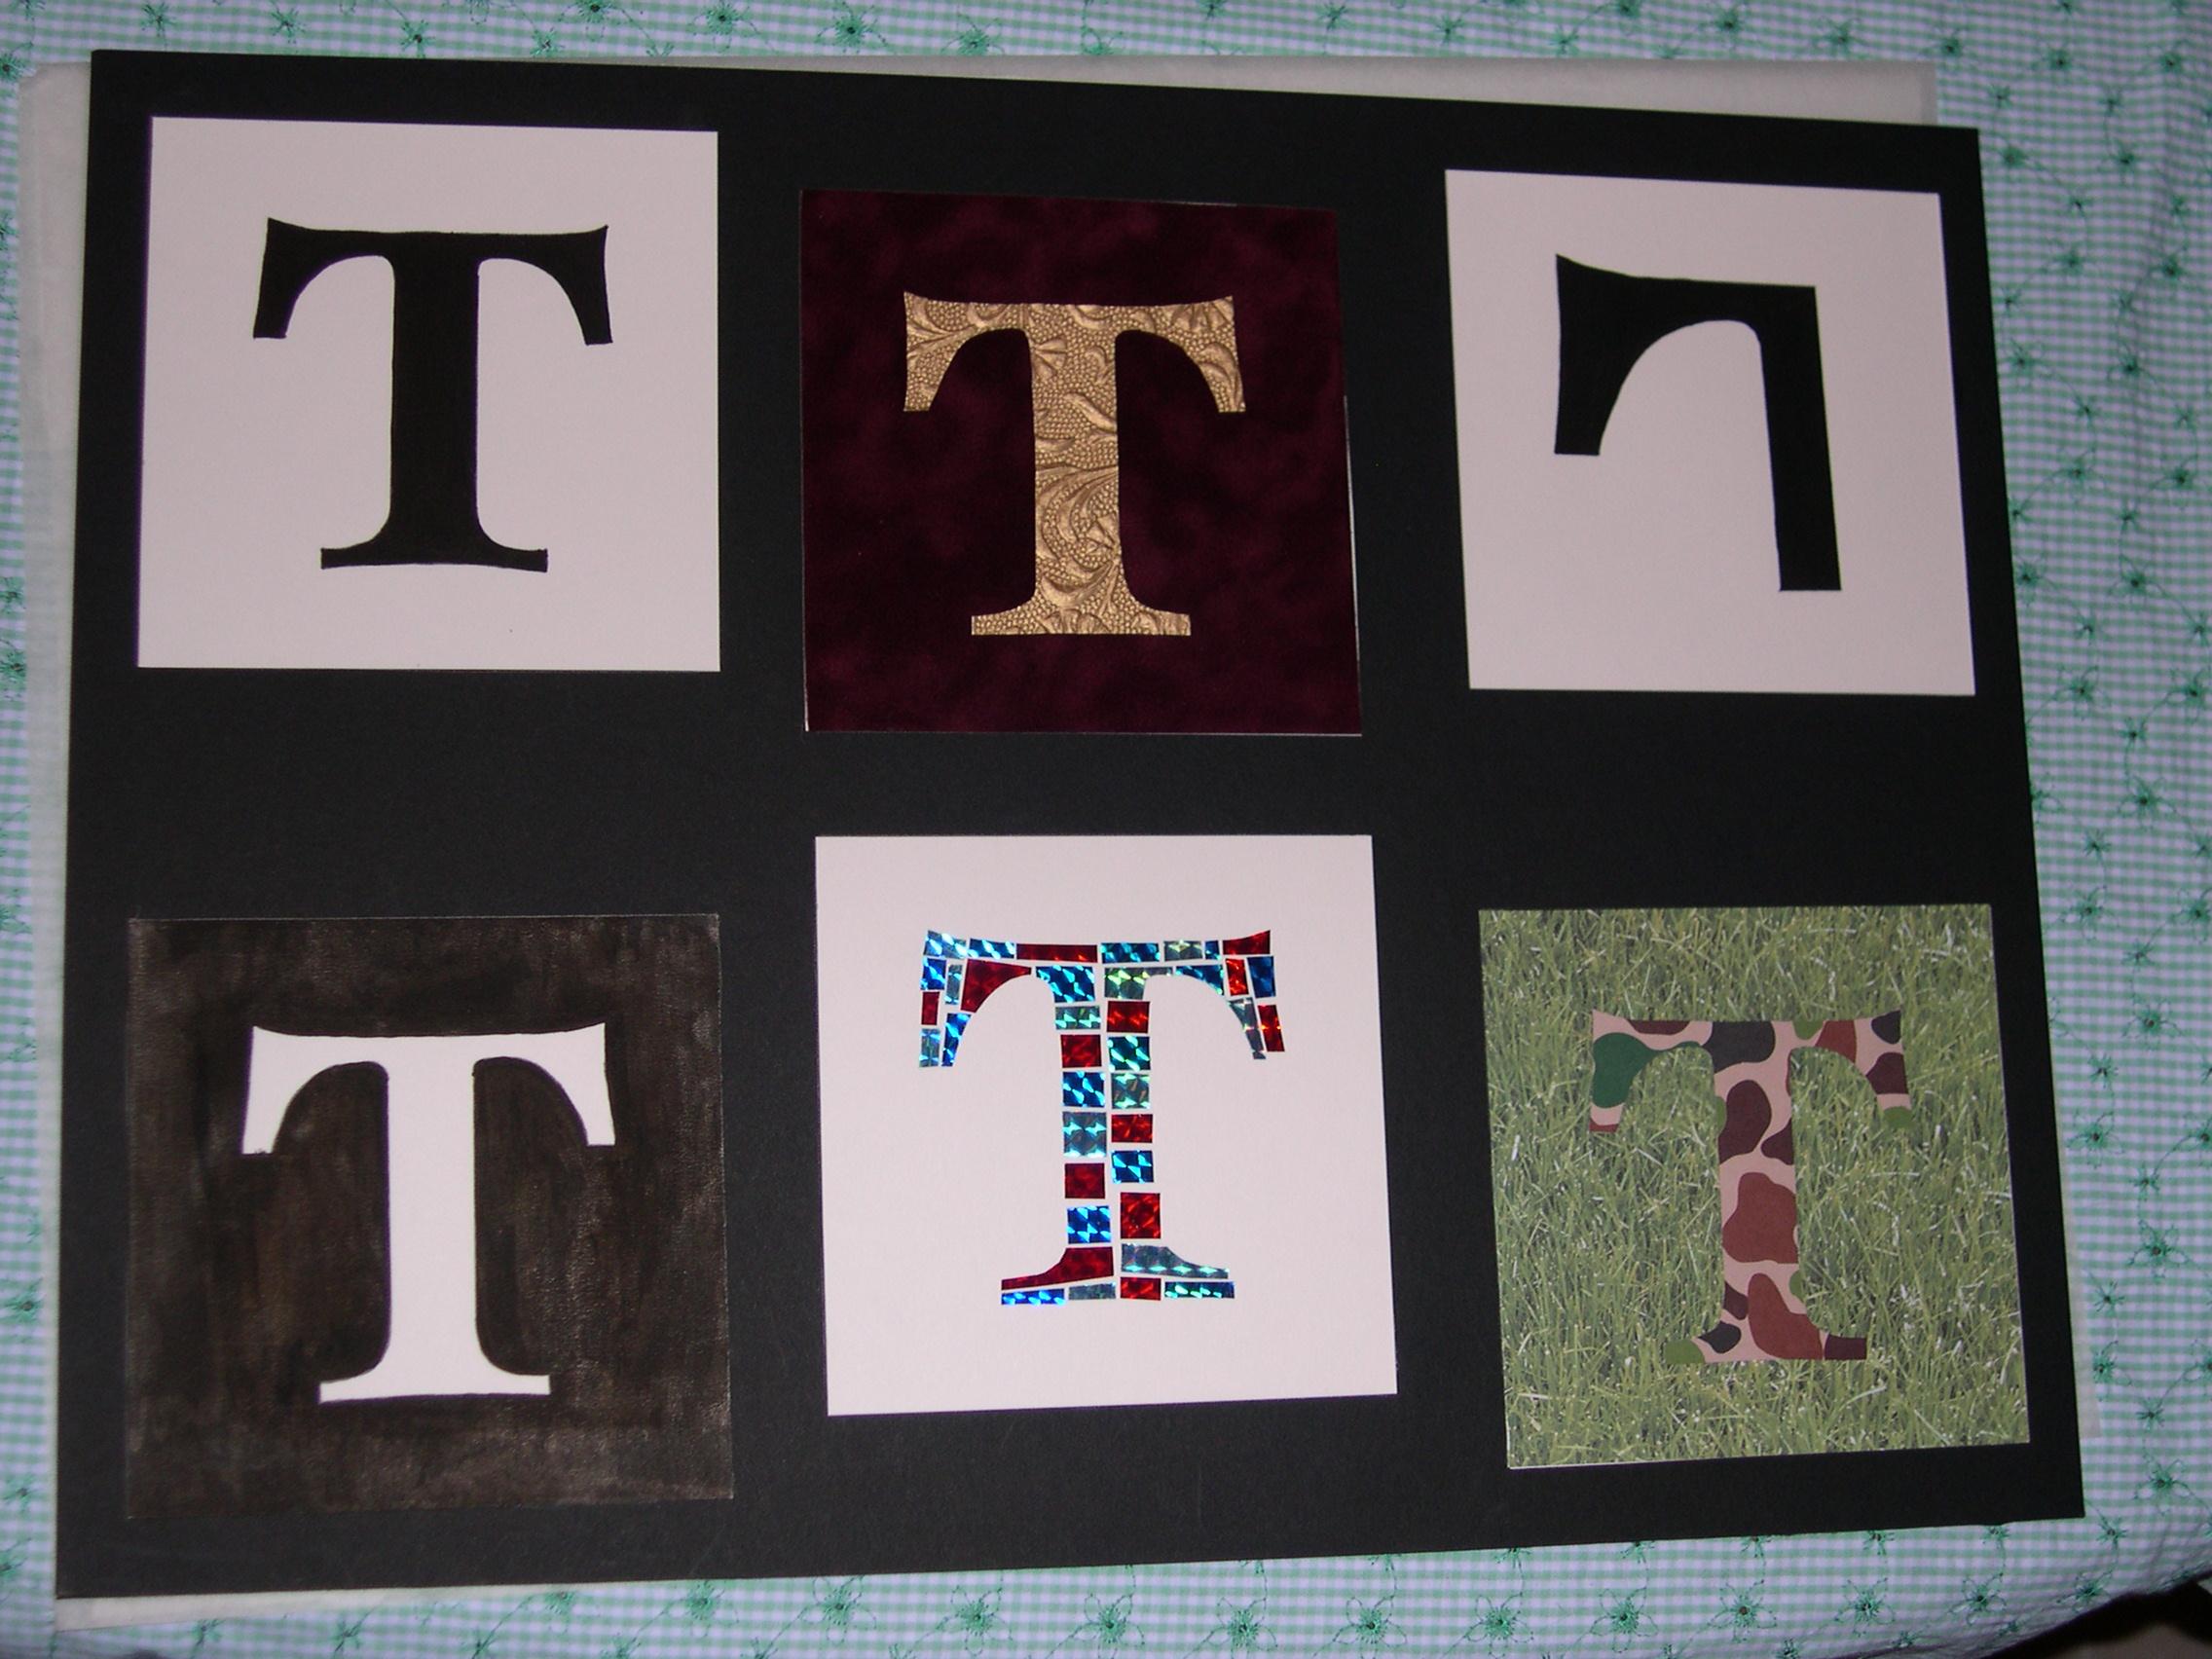 Letterform Study